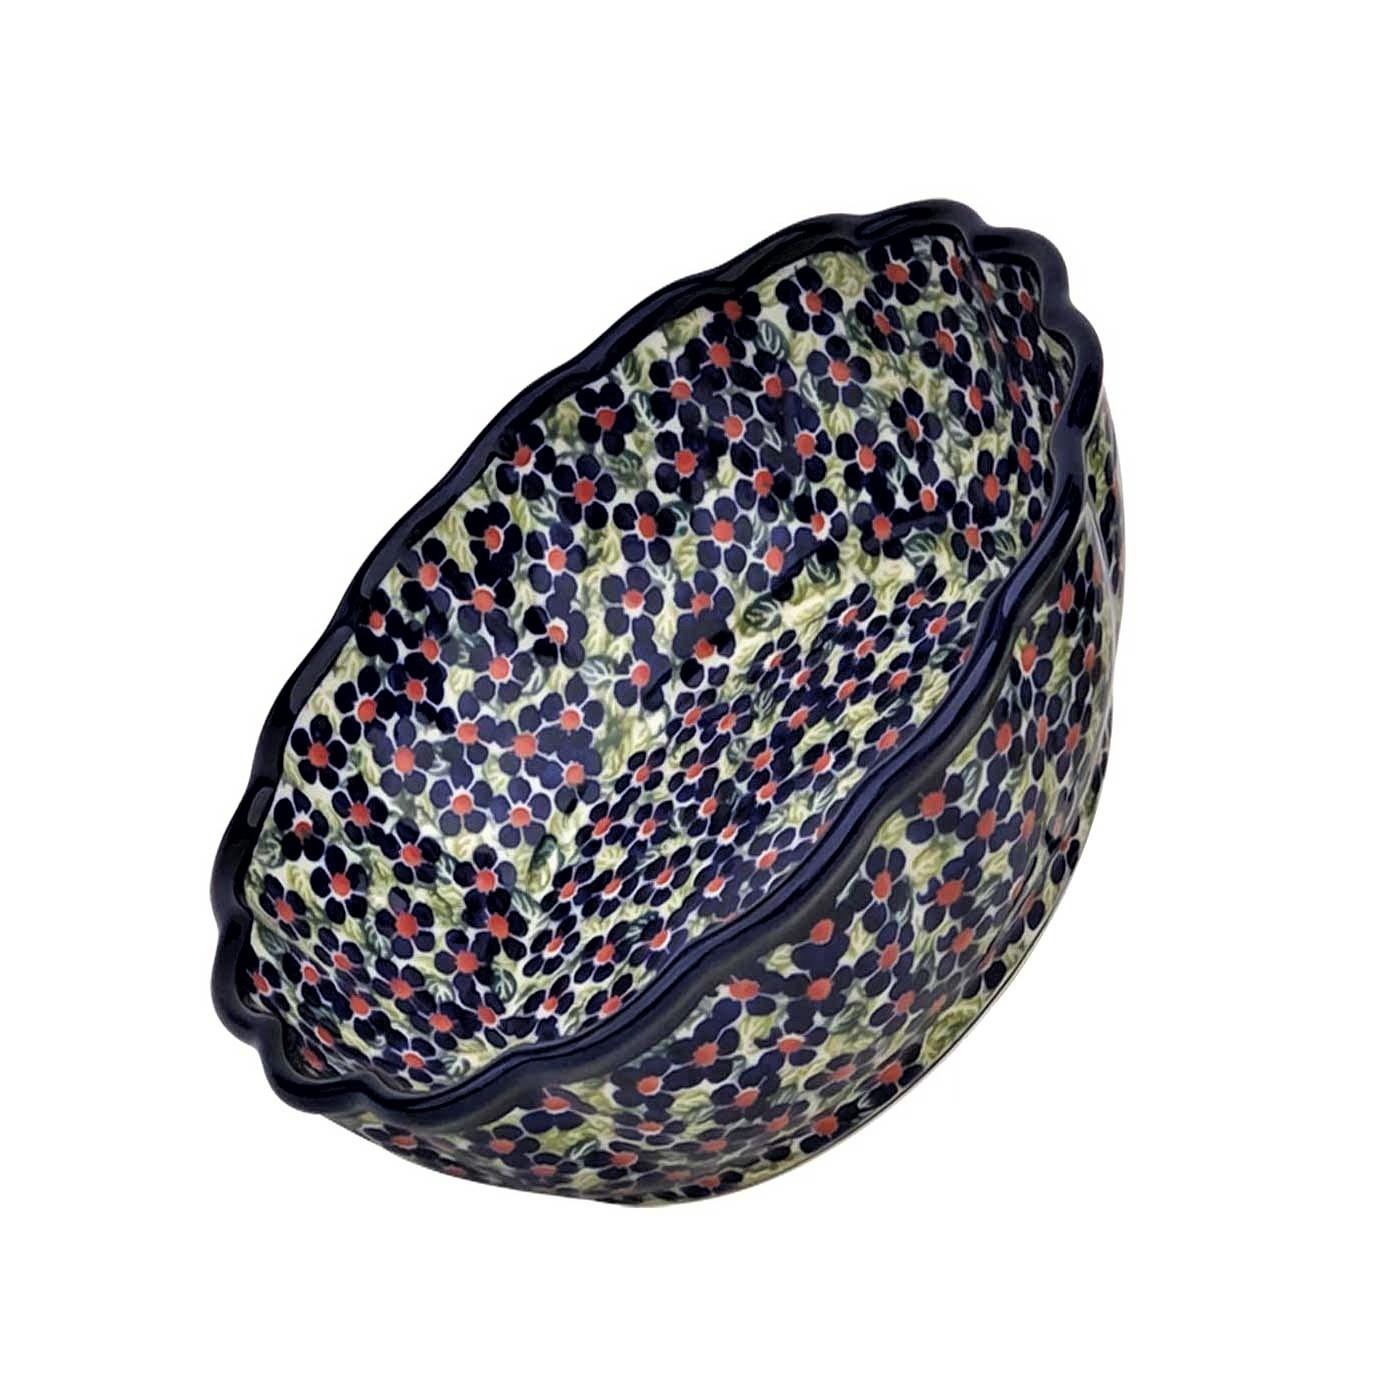 Pottery Avenue Scalloped Stoneware Serving Bowl - 1278-DU206 Friendship